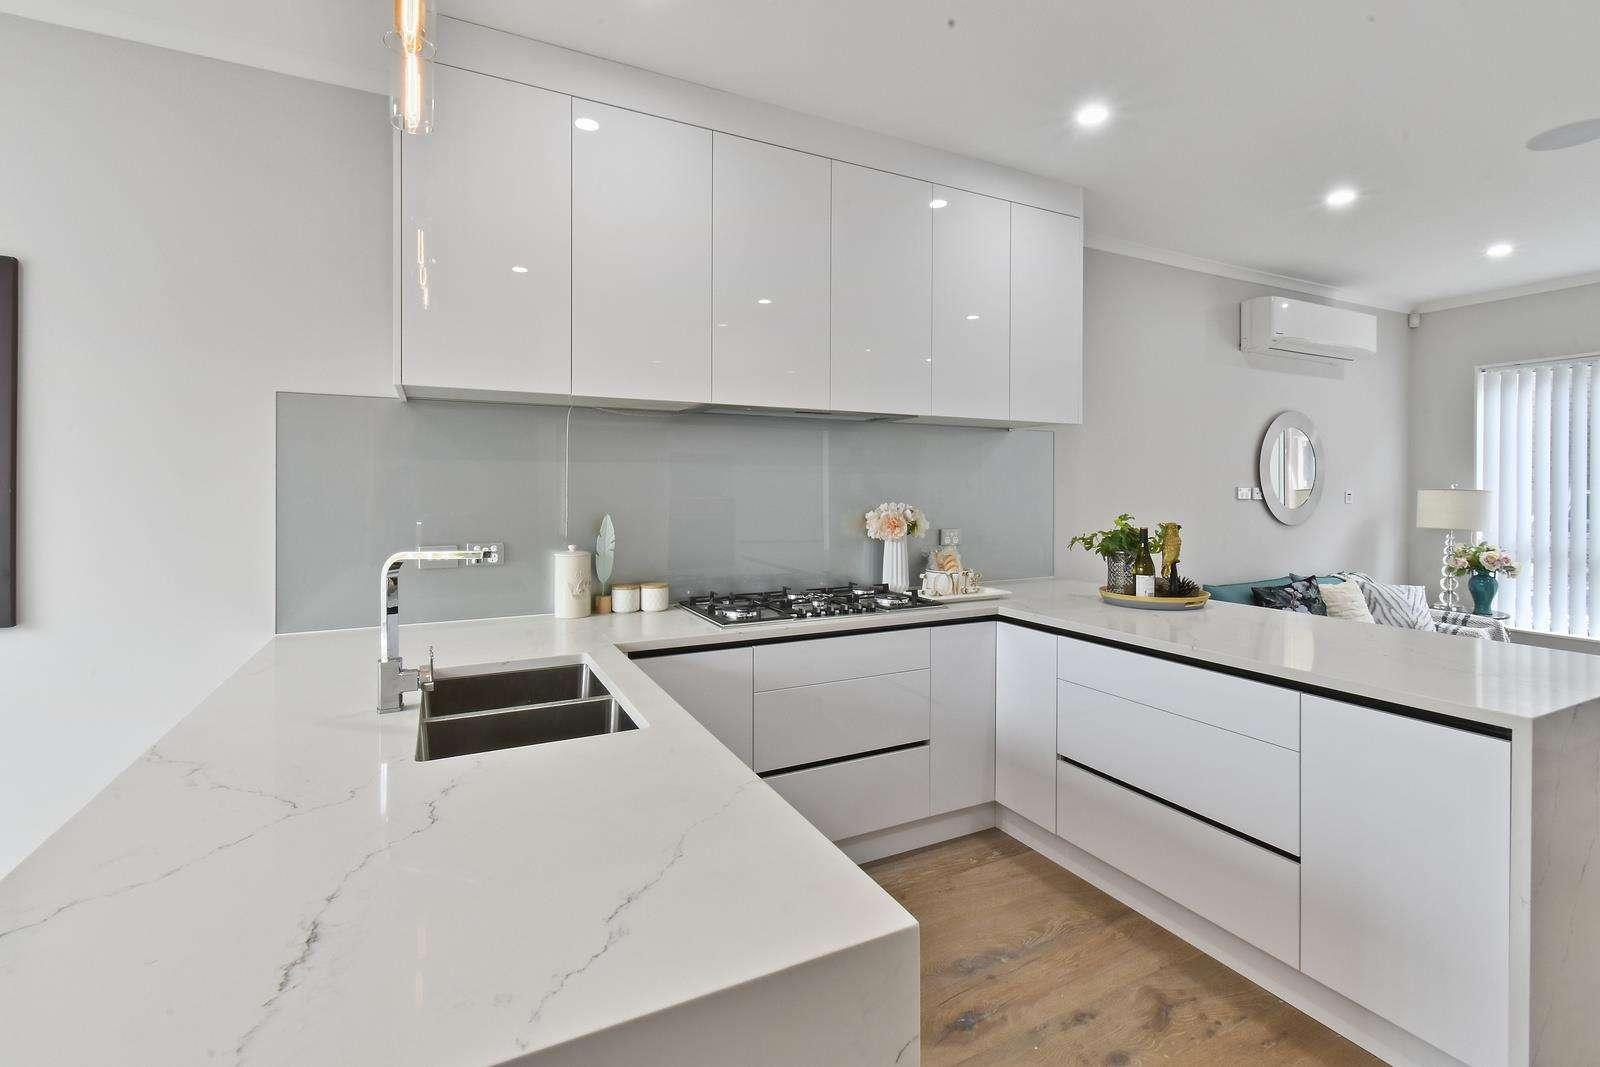 Otahuhu 5房 全新格调舒居 独立产权 私密性强 邻近便利设施 奢享一流配套 可轻松上高速 Space , Style & Versatile Living